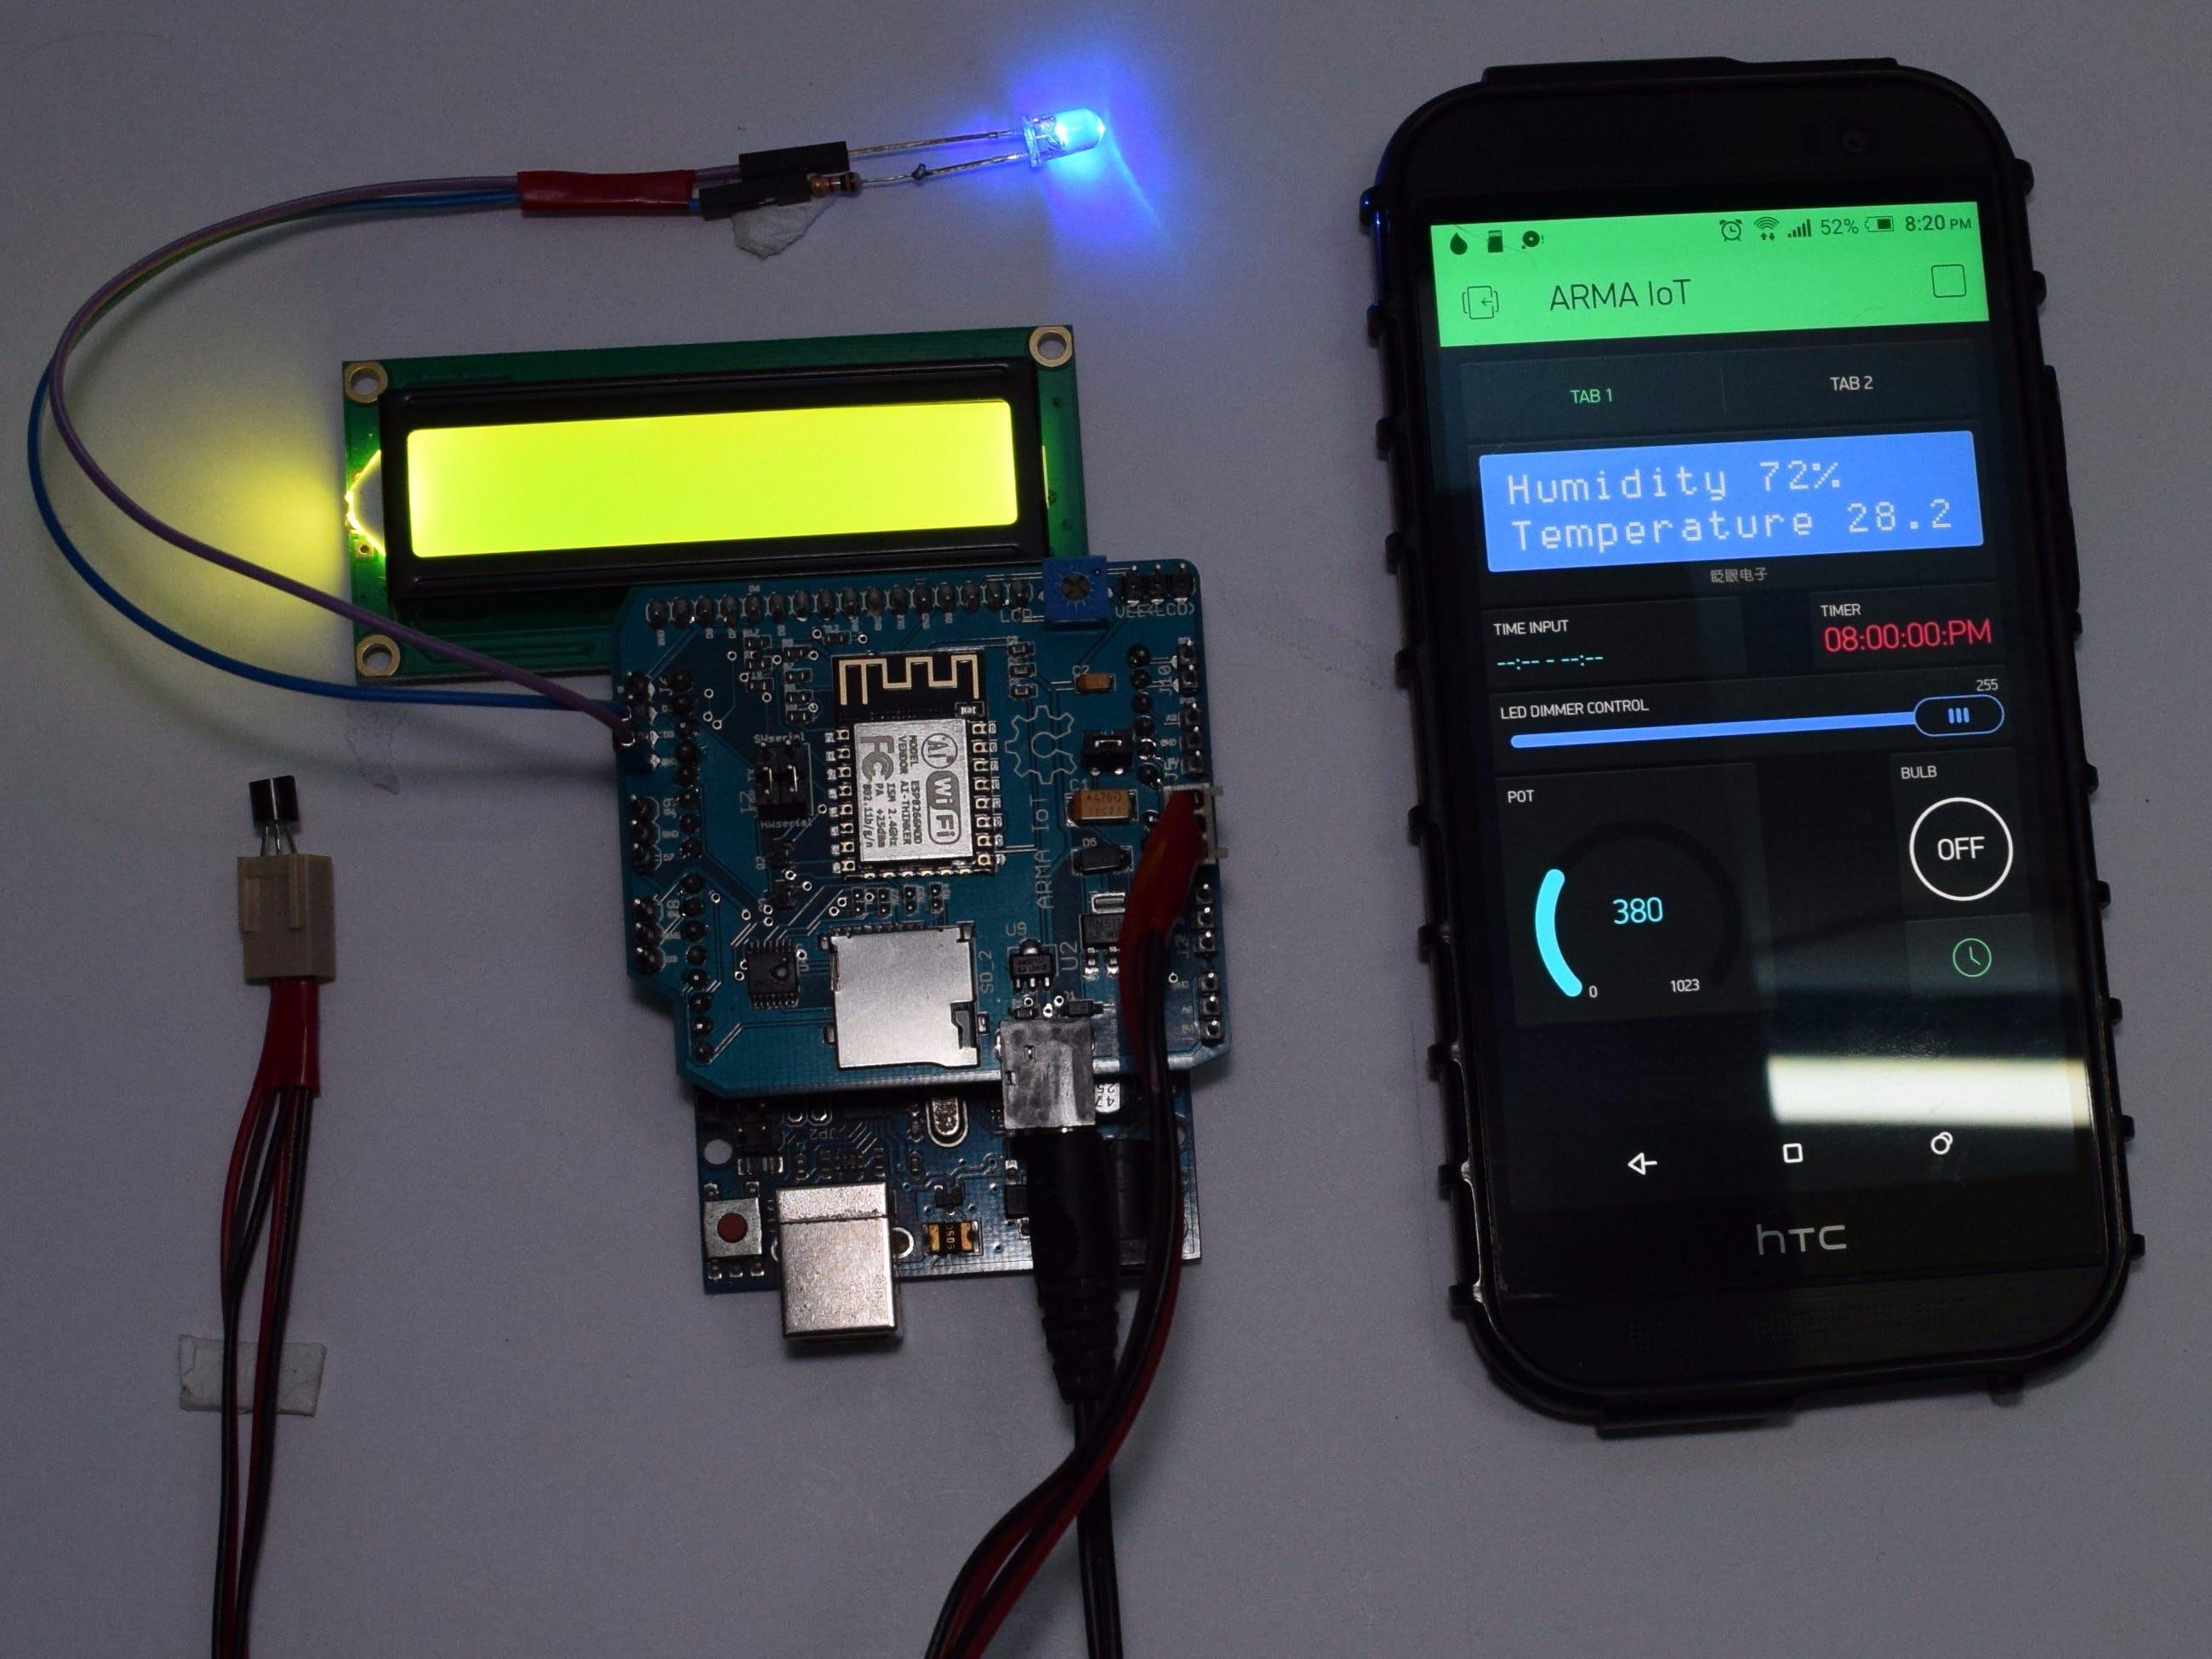 Interfacing ARMA IoT with Blynk